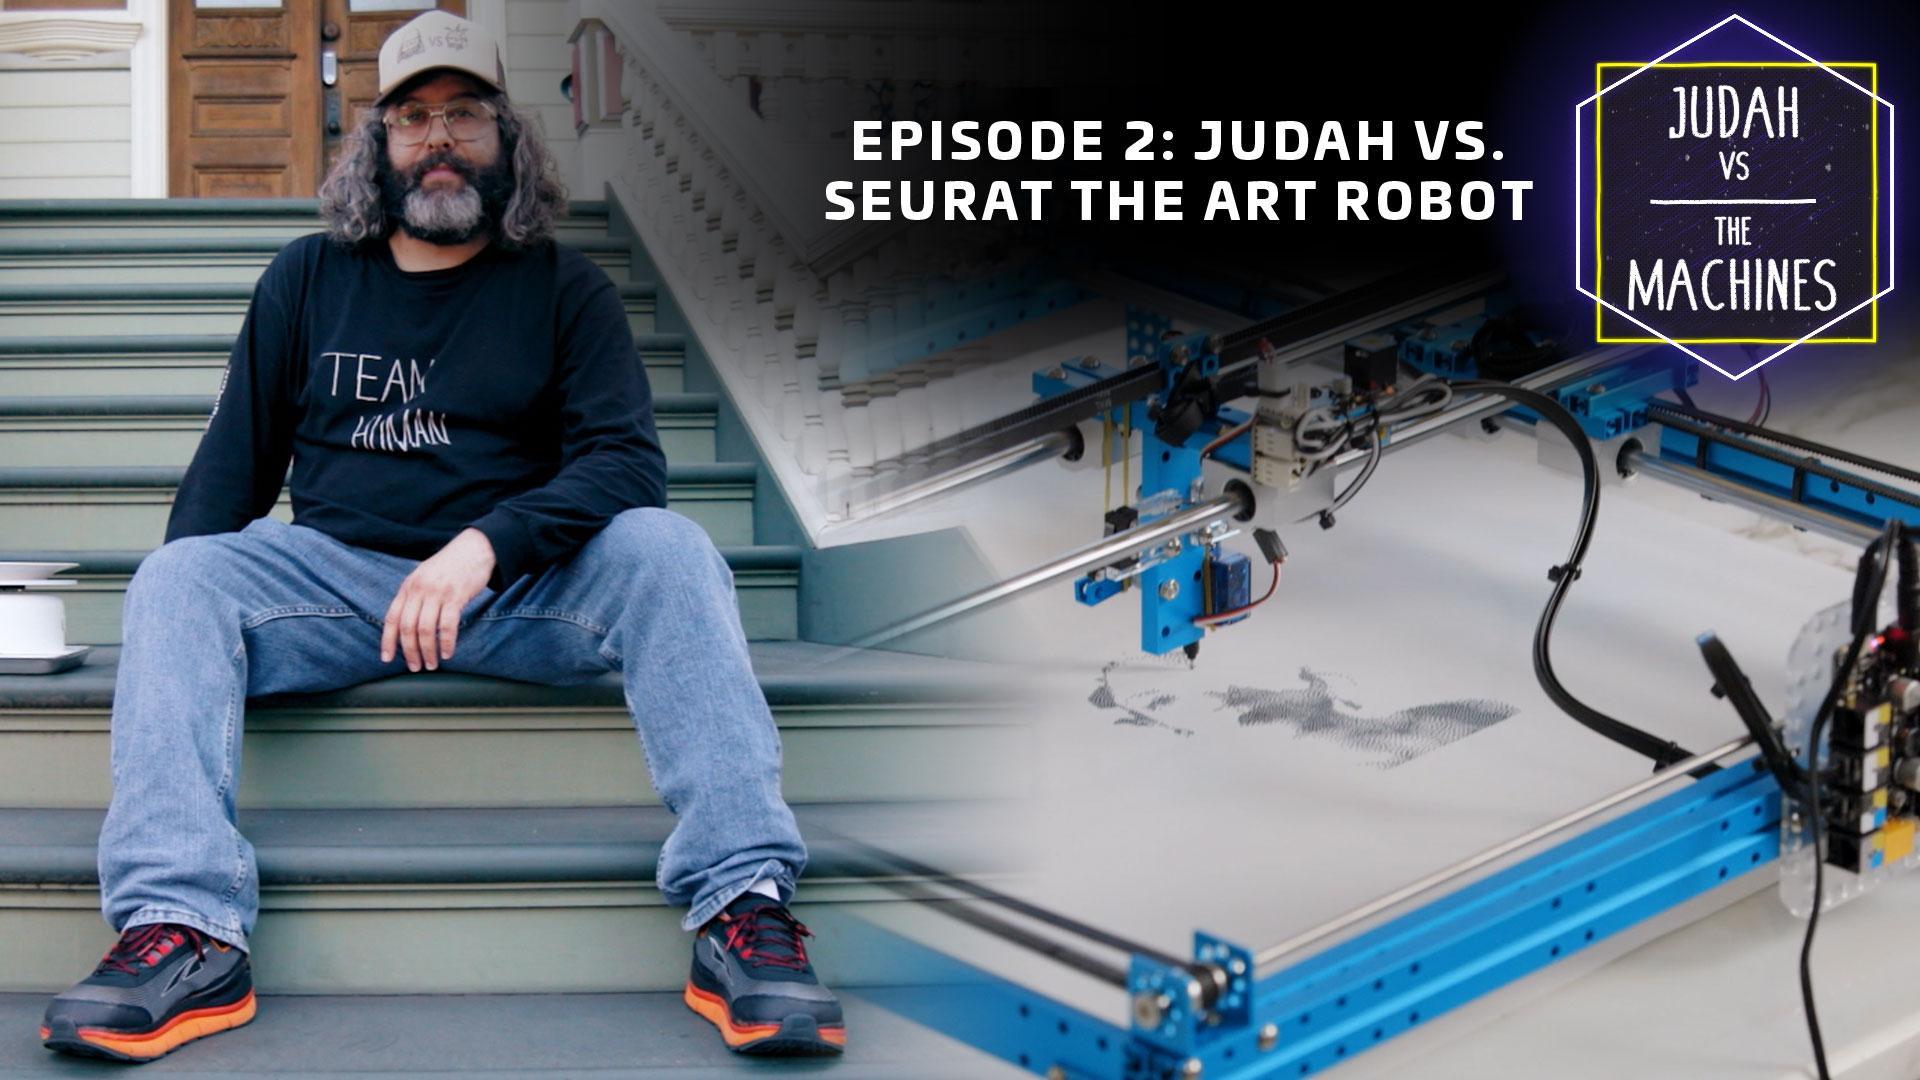 Judah vs Seurat the art robot